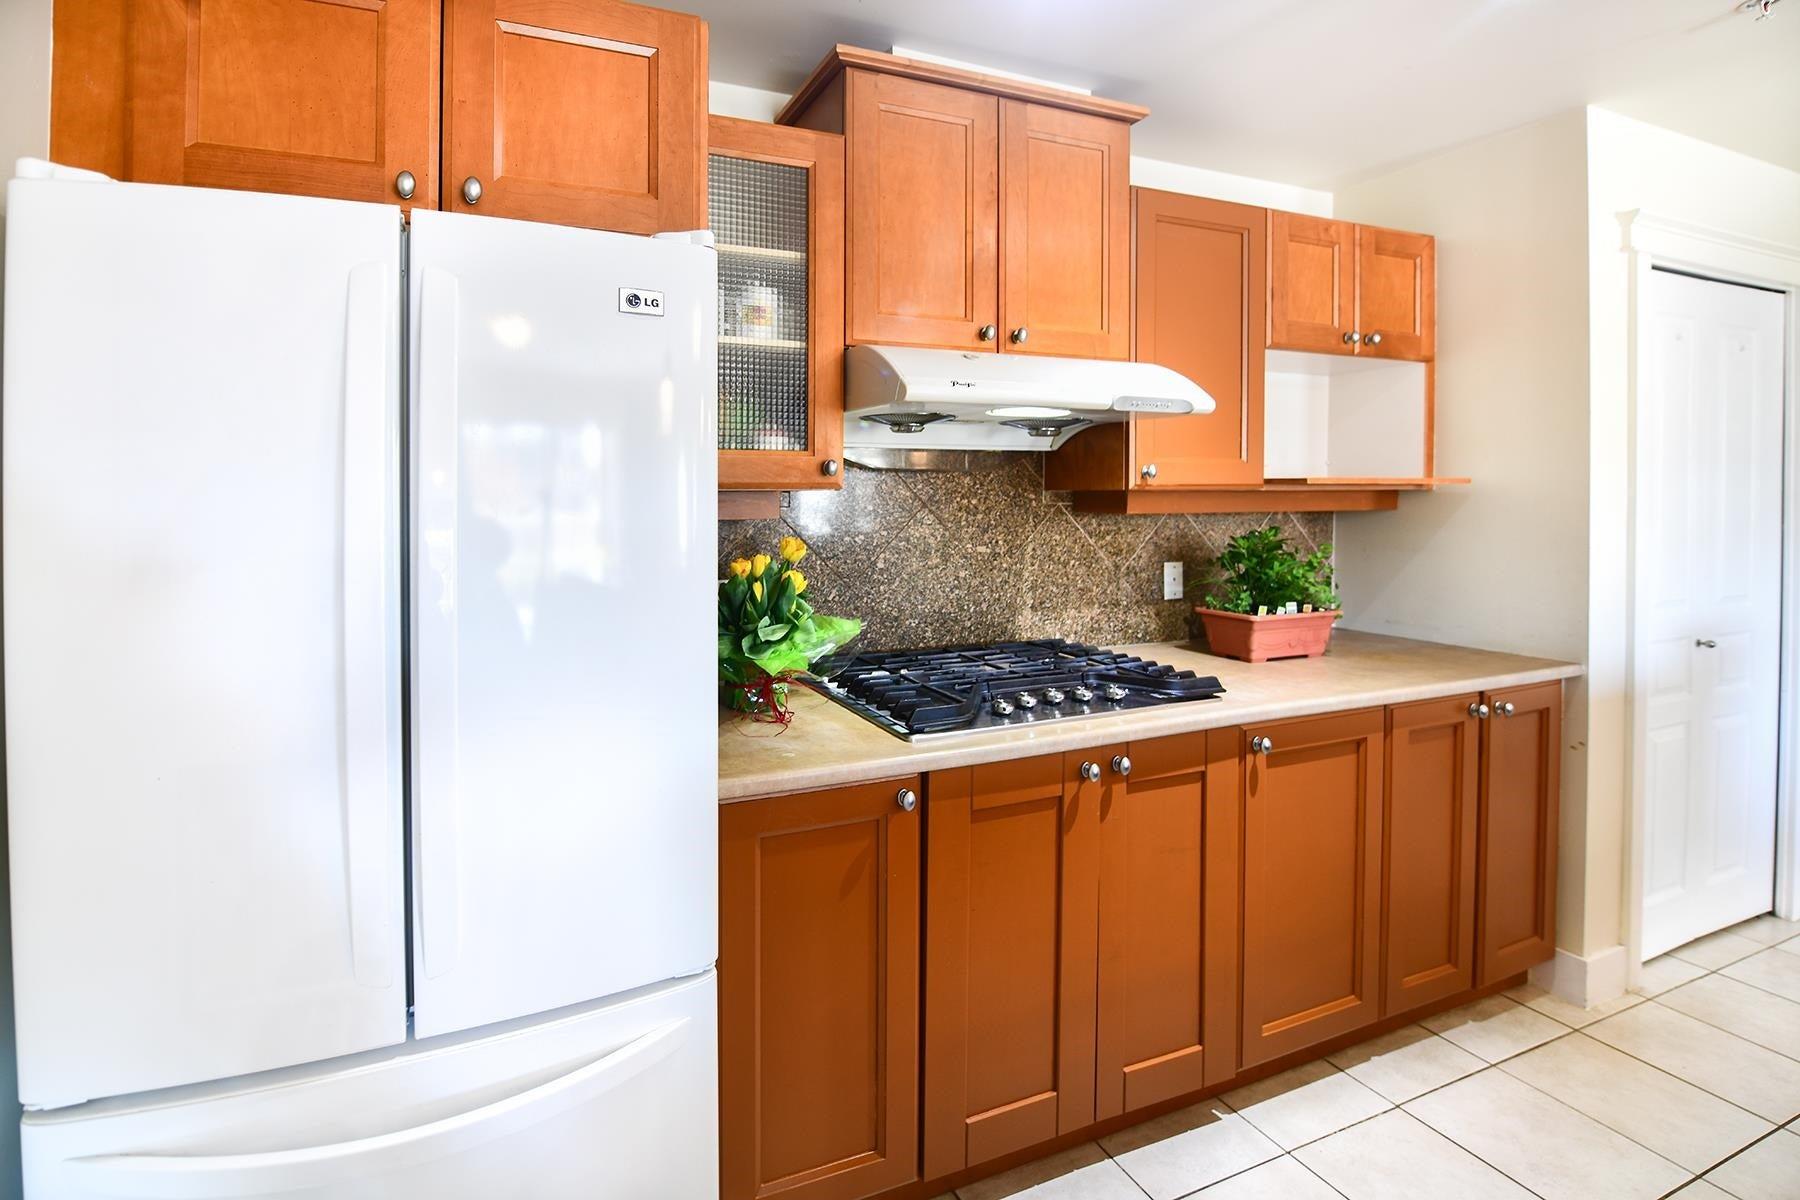 204 5790 EAST BOULEVARD - Kerrisdale Apartment/Condo for sale, 3 Bedrooms (R2604138) - #10